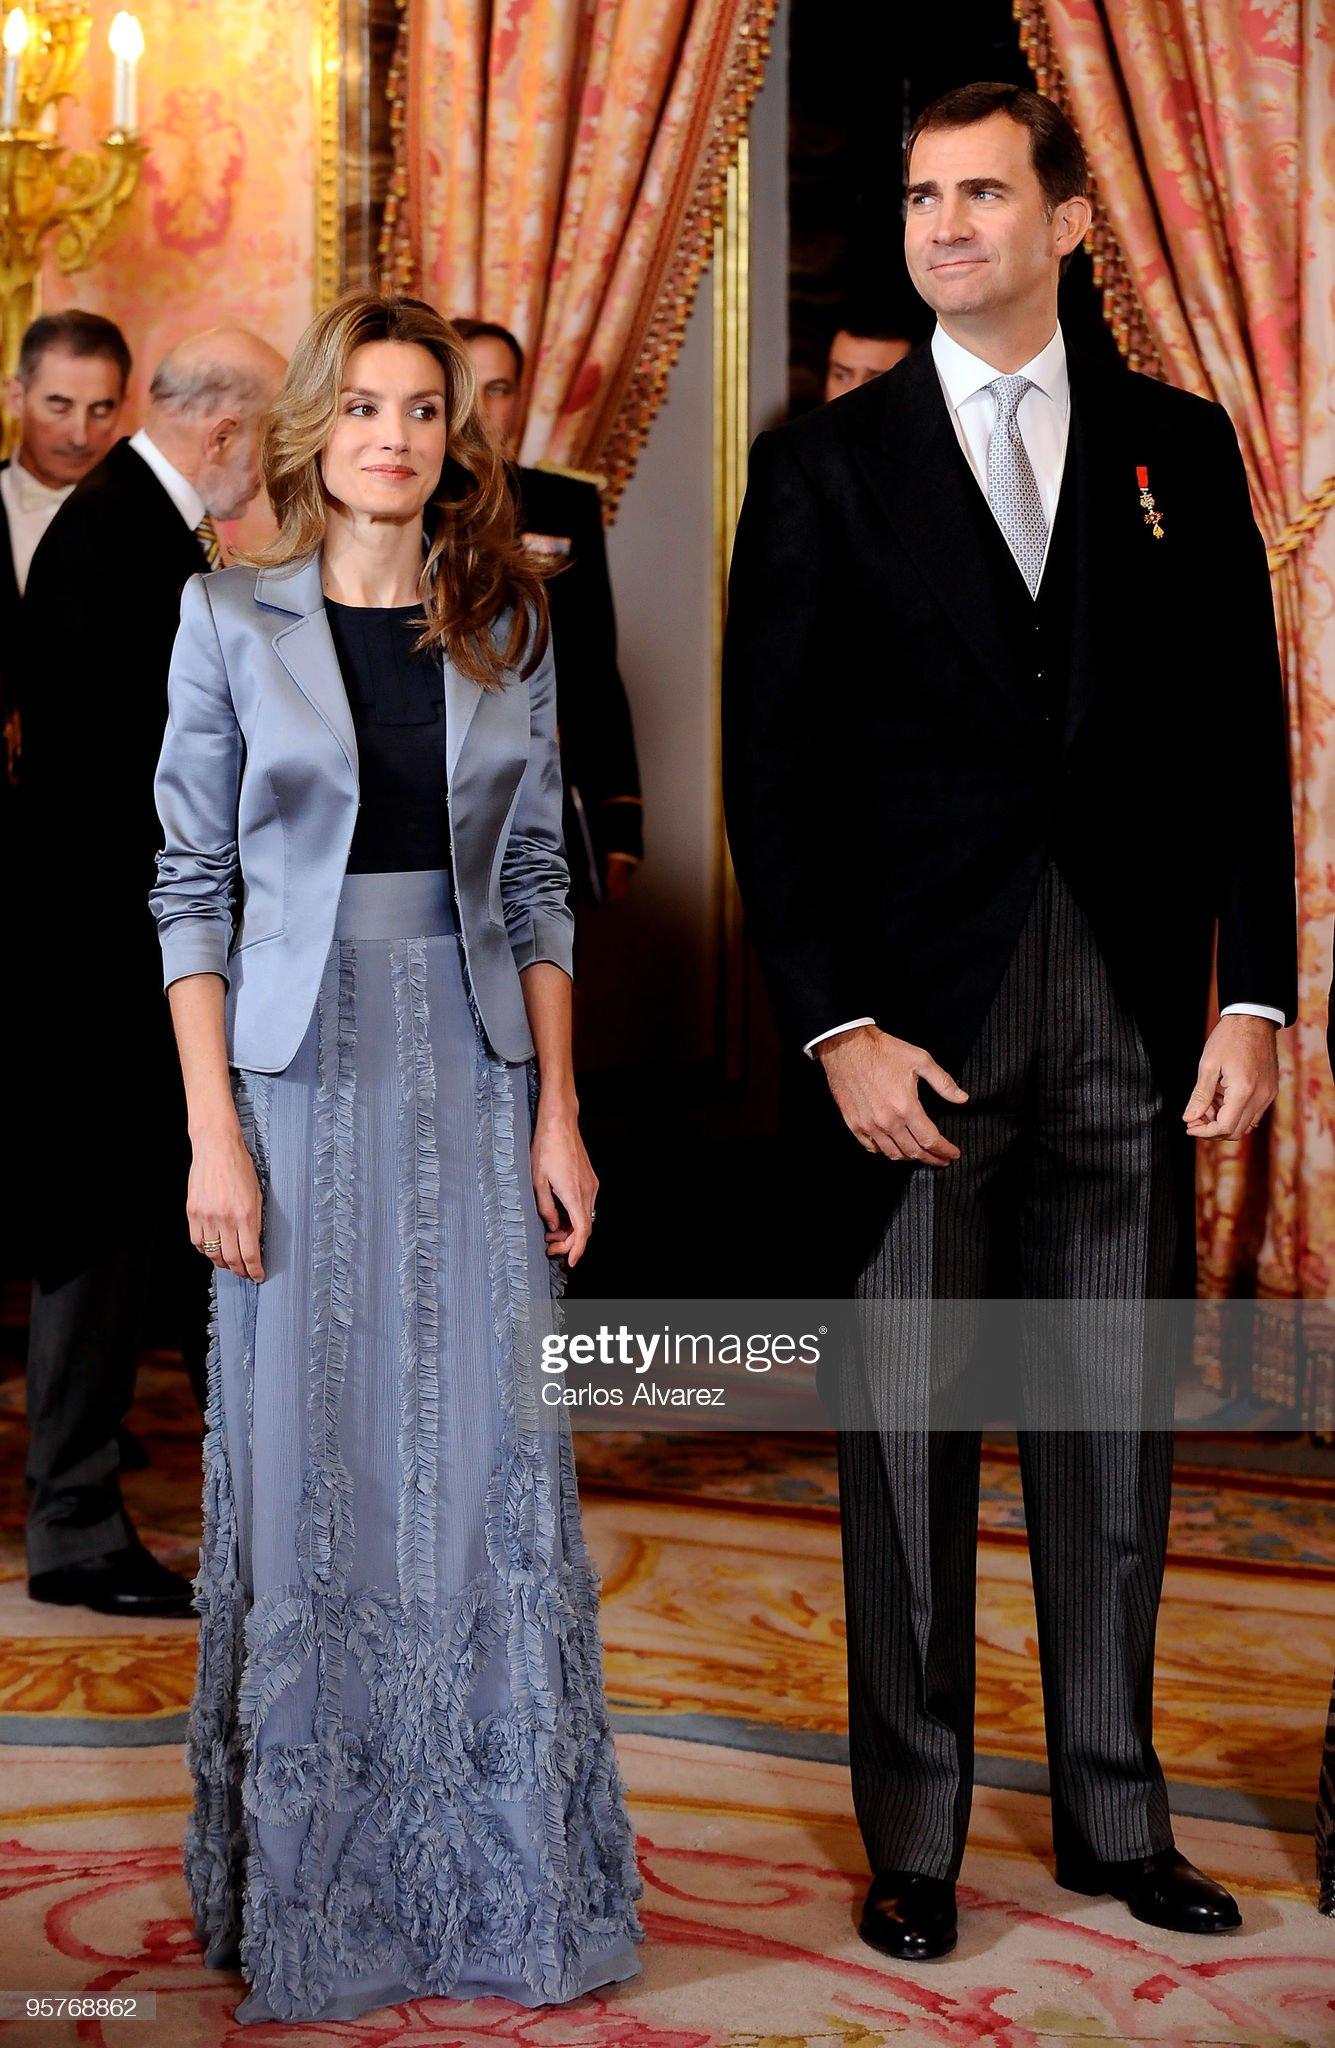 Вечерние наряды Королевы Летиции Spanish Royals Host Ambassadors Reception in Madrid : News Photo